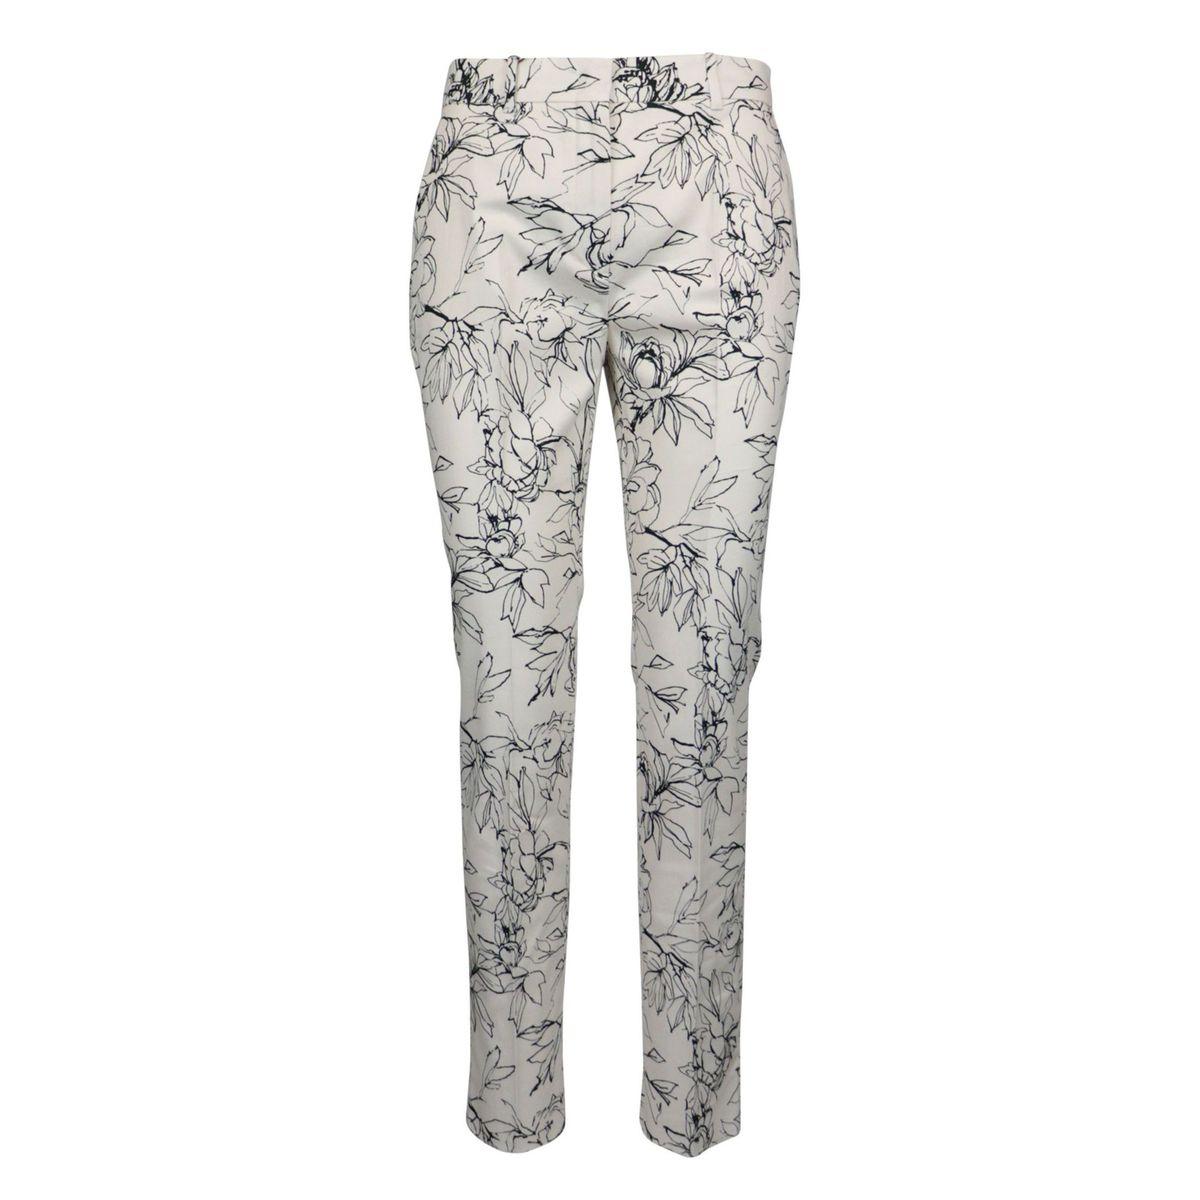 Perim cigarette trousers in patterned stretch cotton poplin White black MAX MARA STUDIO